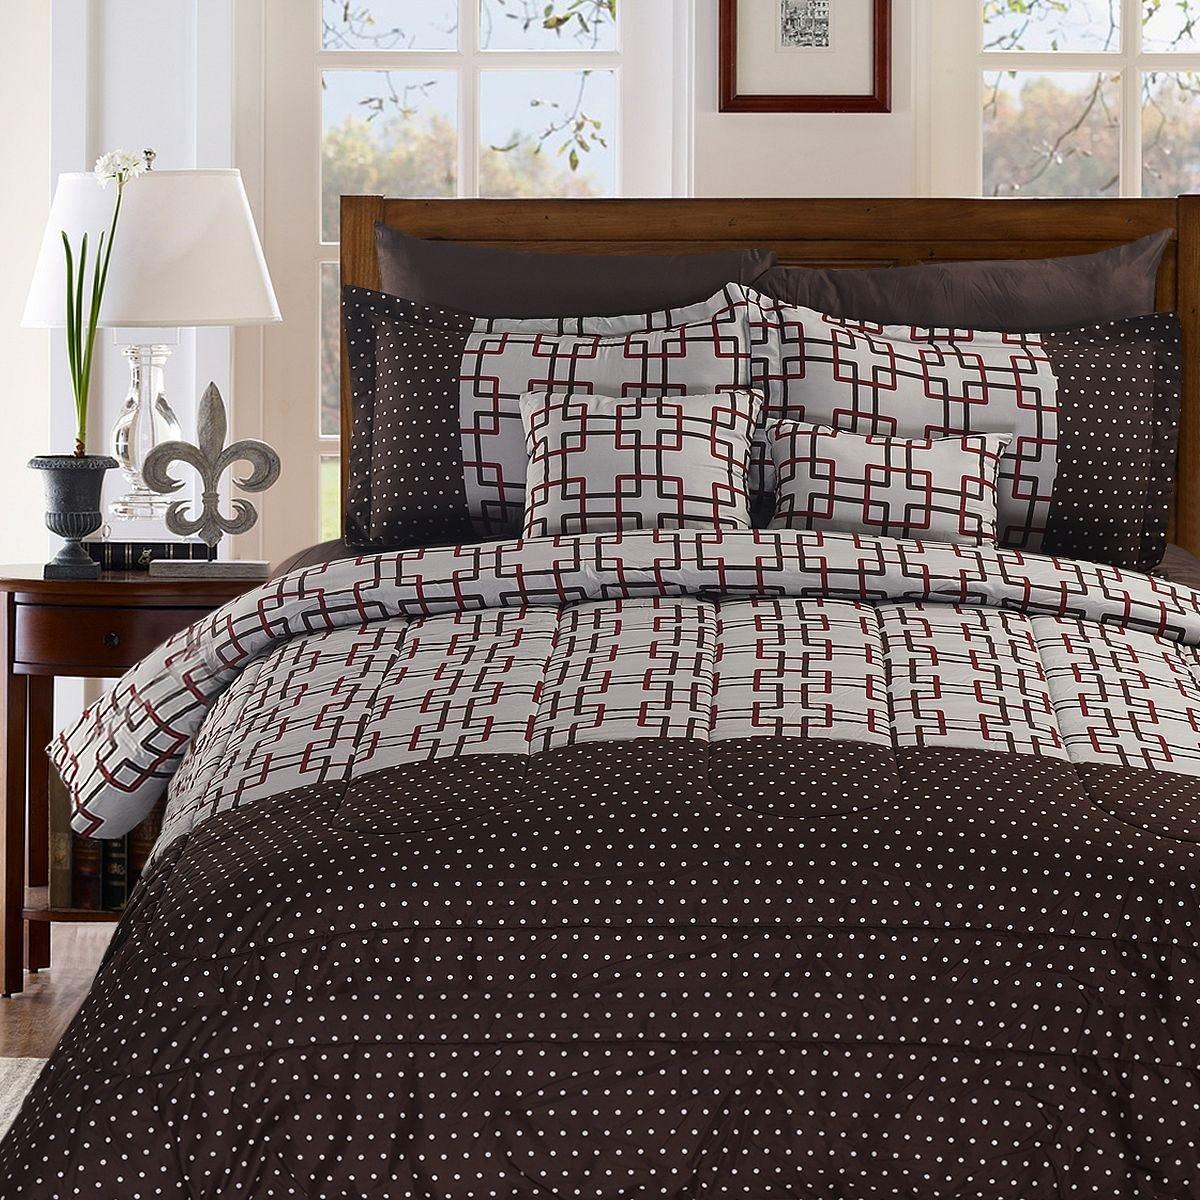 MasterPanel - King Size 8+2 Piece Luxury Plaid Bedding Comforter Set Plaid Prints by MasterPanel